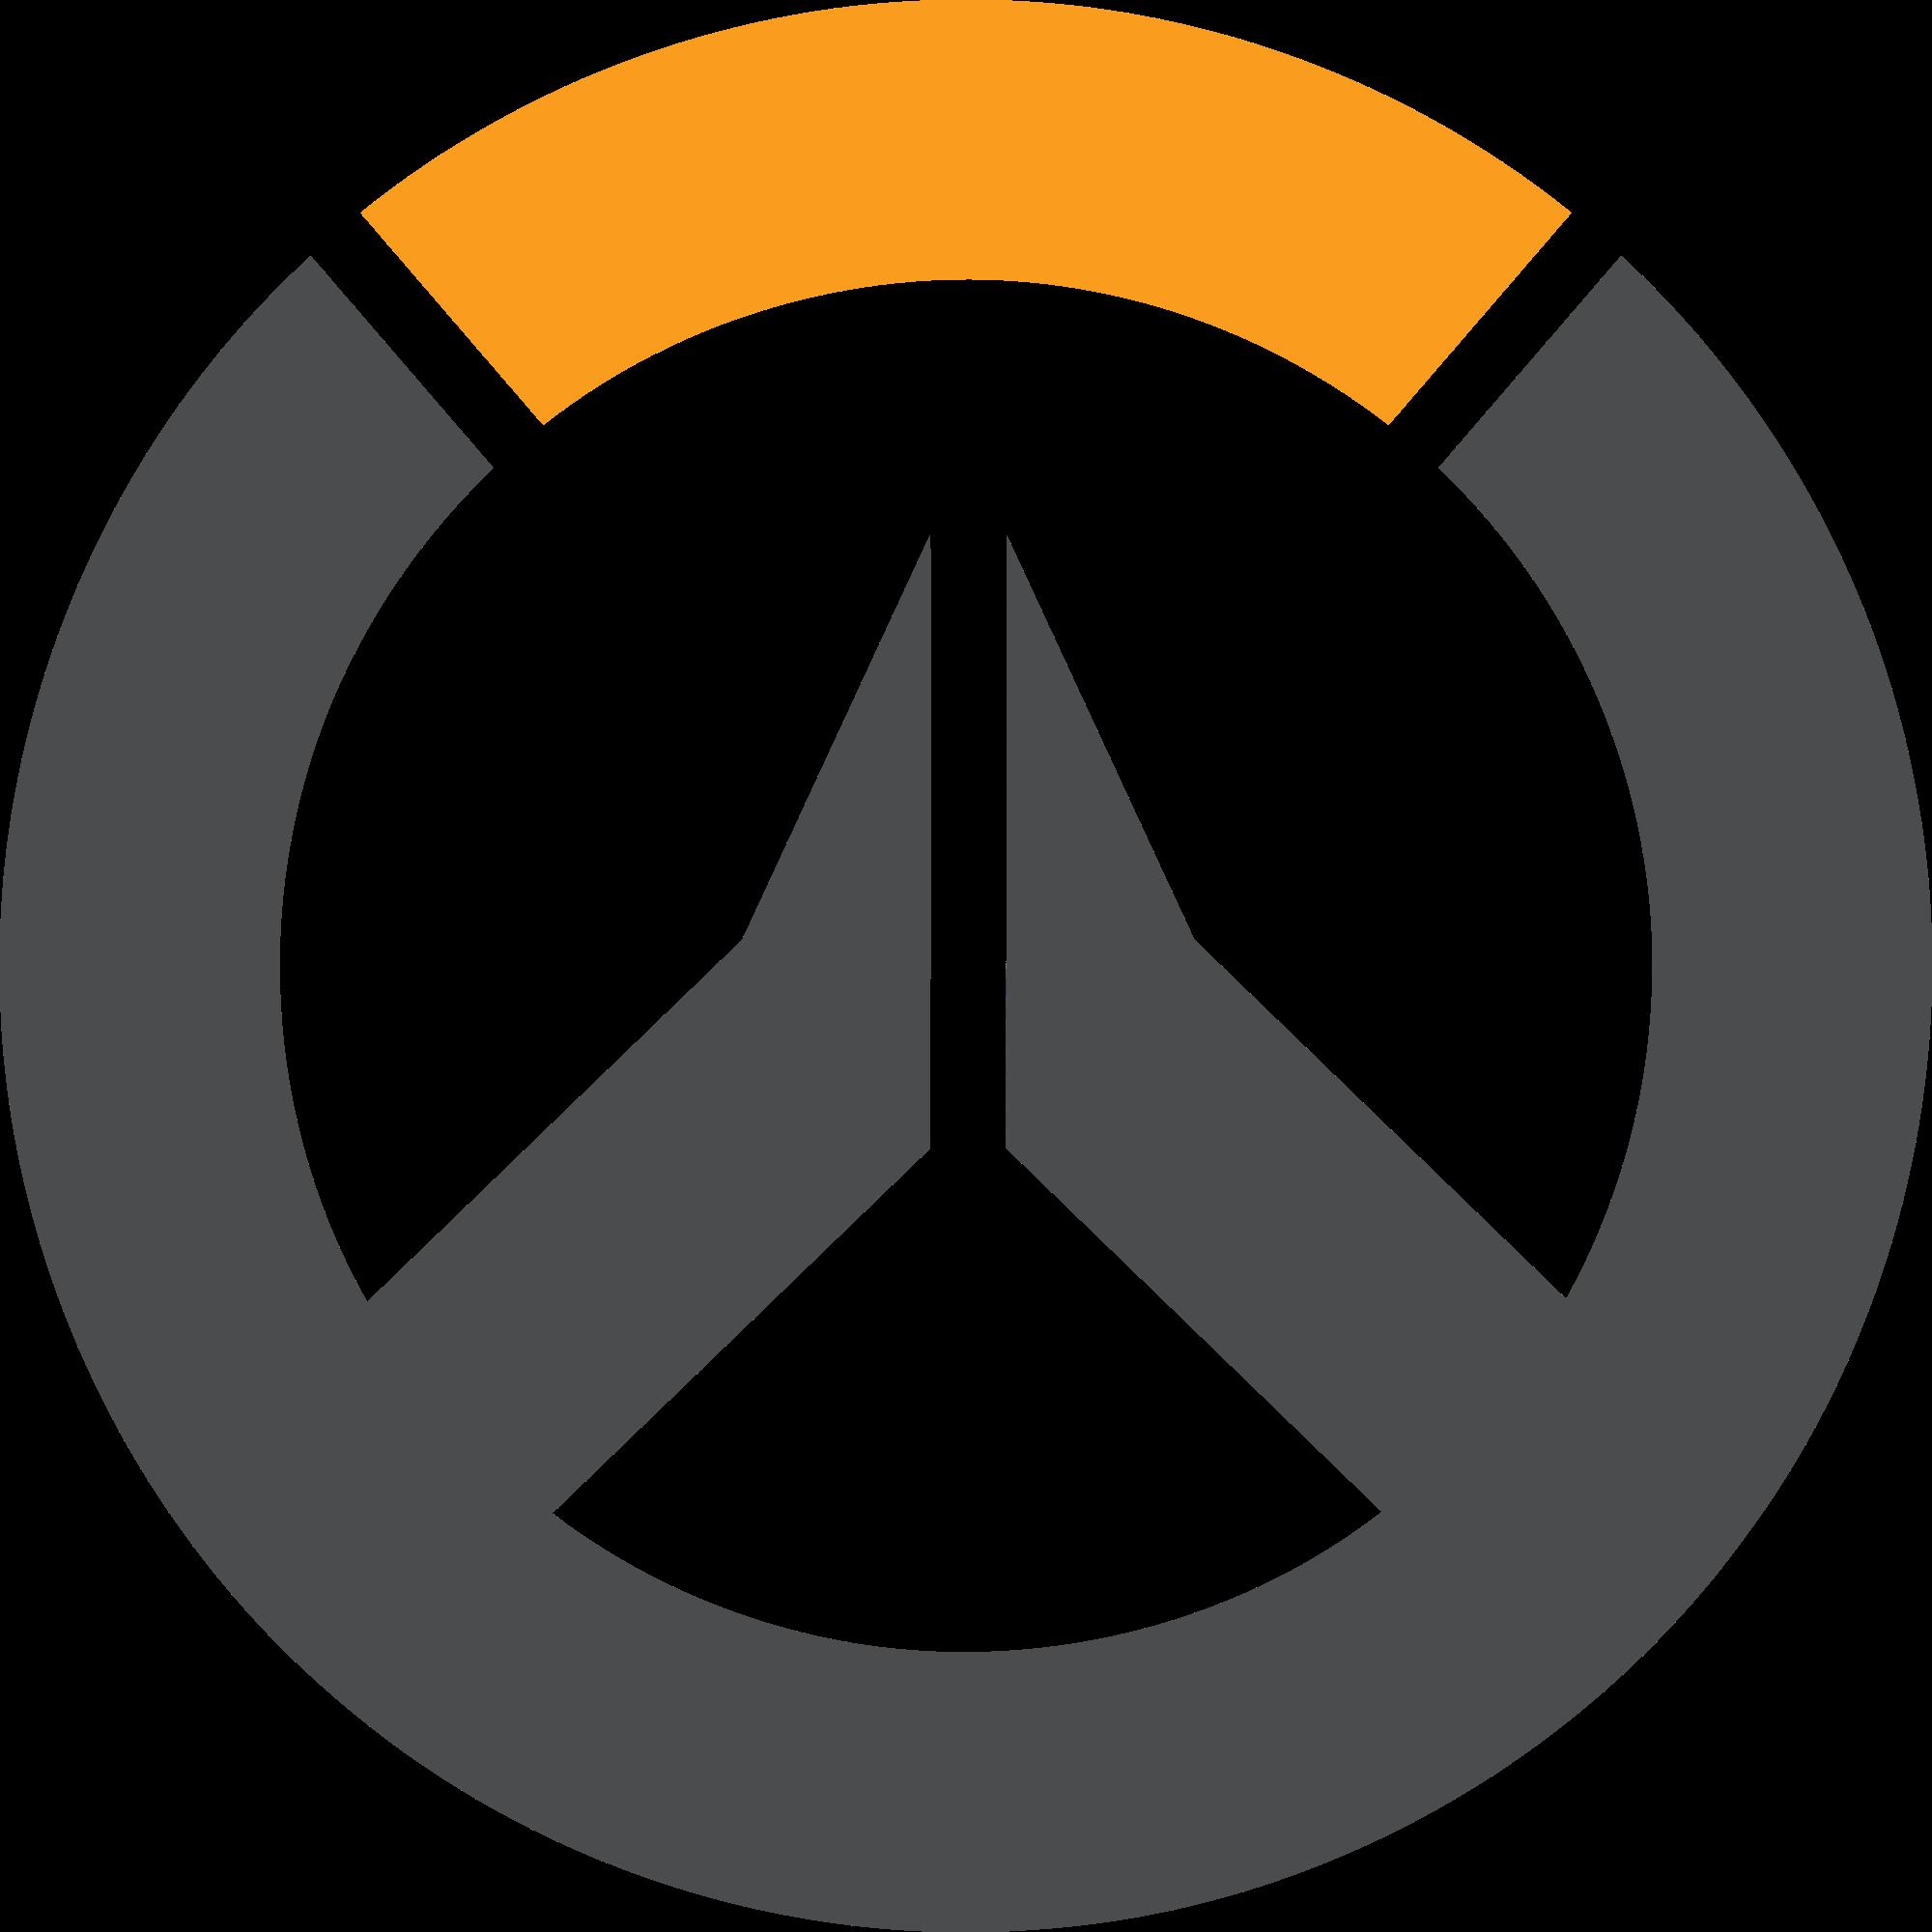 Overwatch symbol png, Overwatch symbol png Transparent FREE.